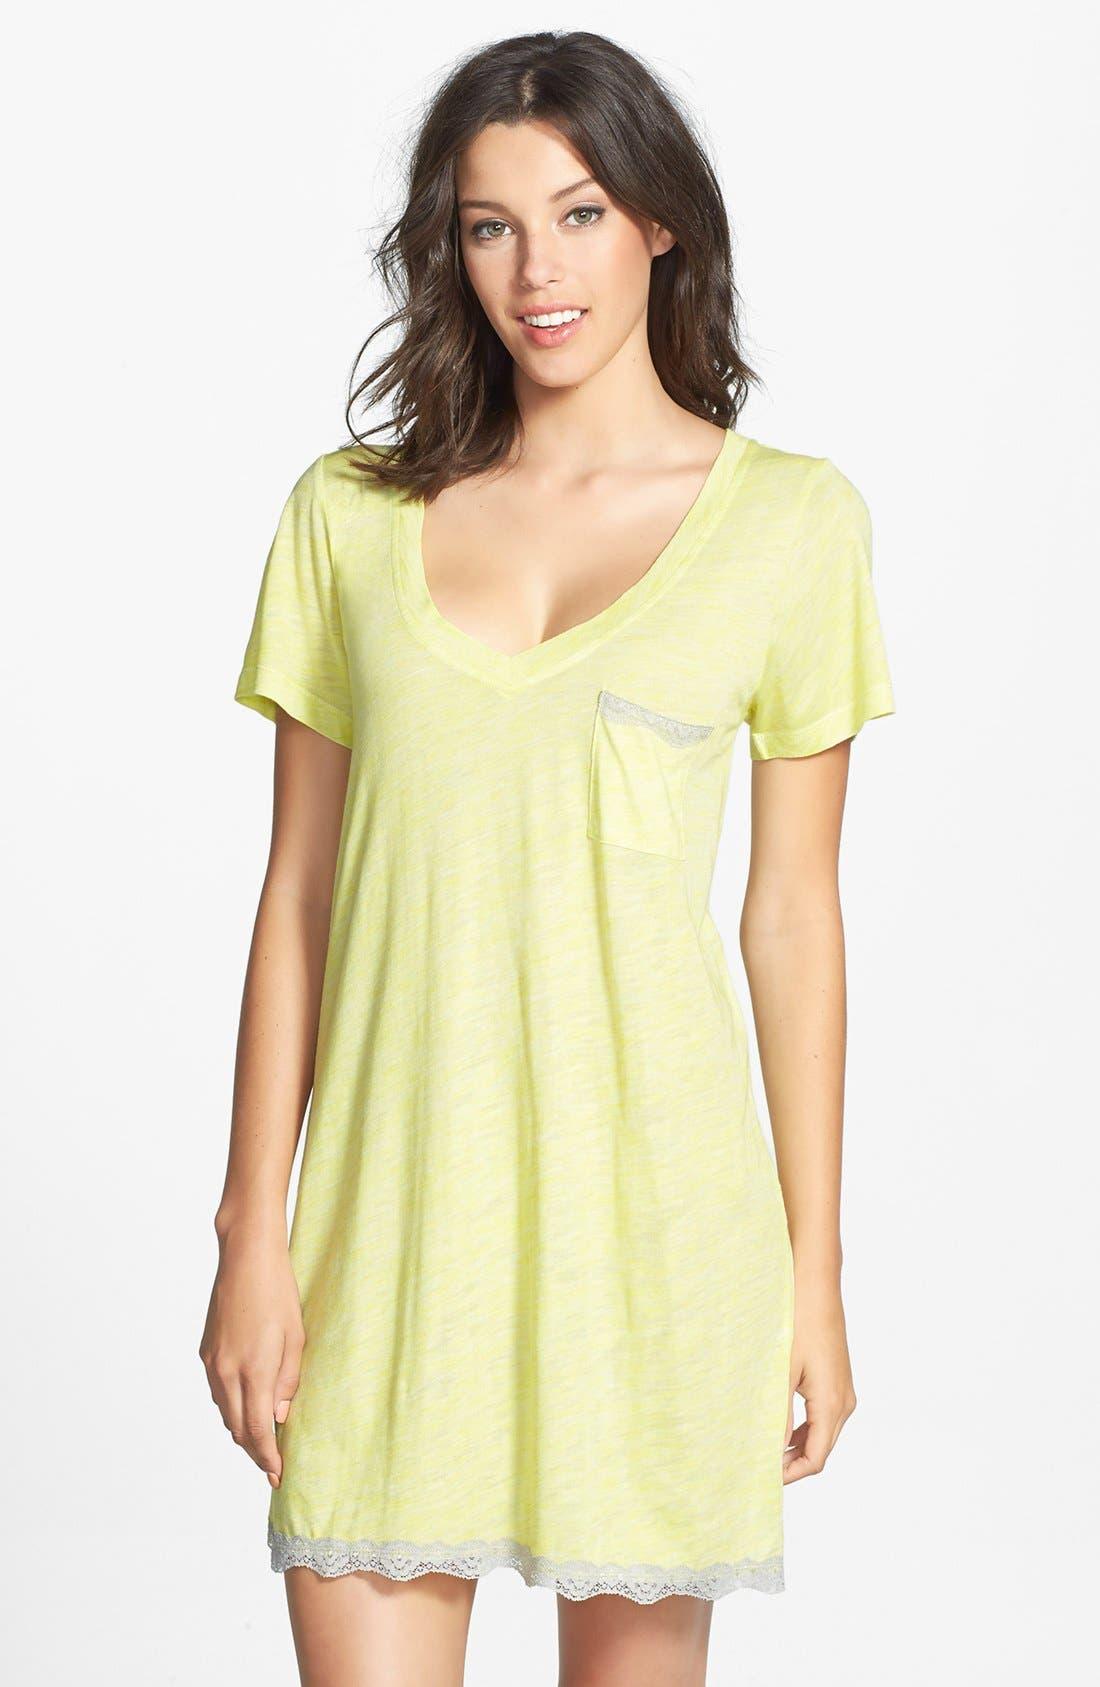 Main Image - Honeydew Intimates Lace Trim Sleep Shirt